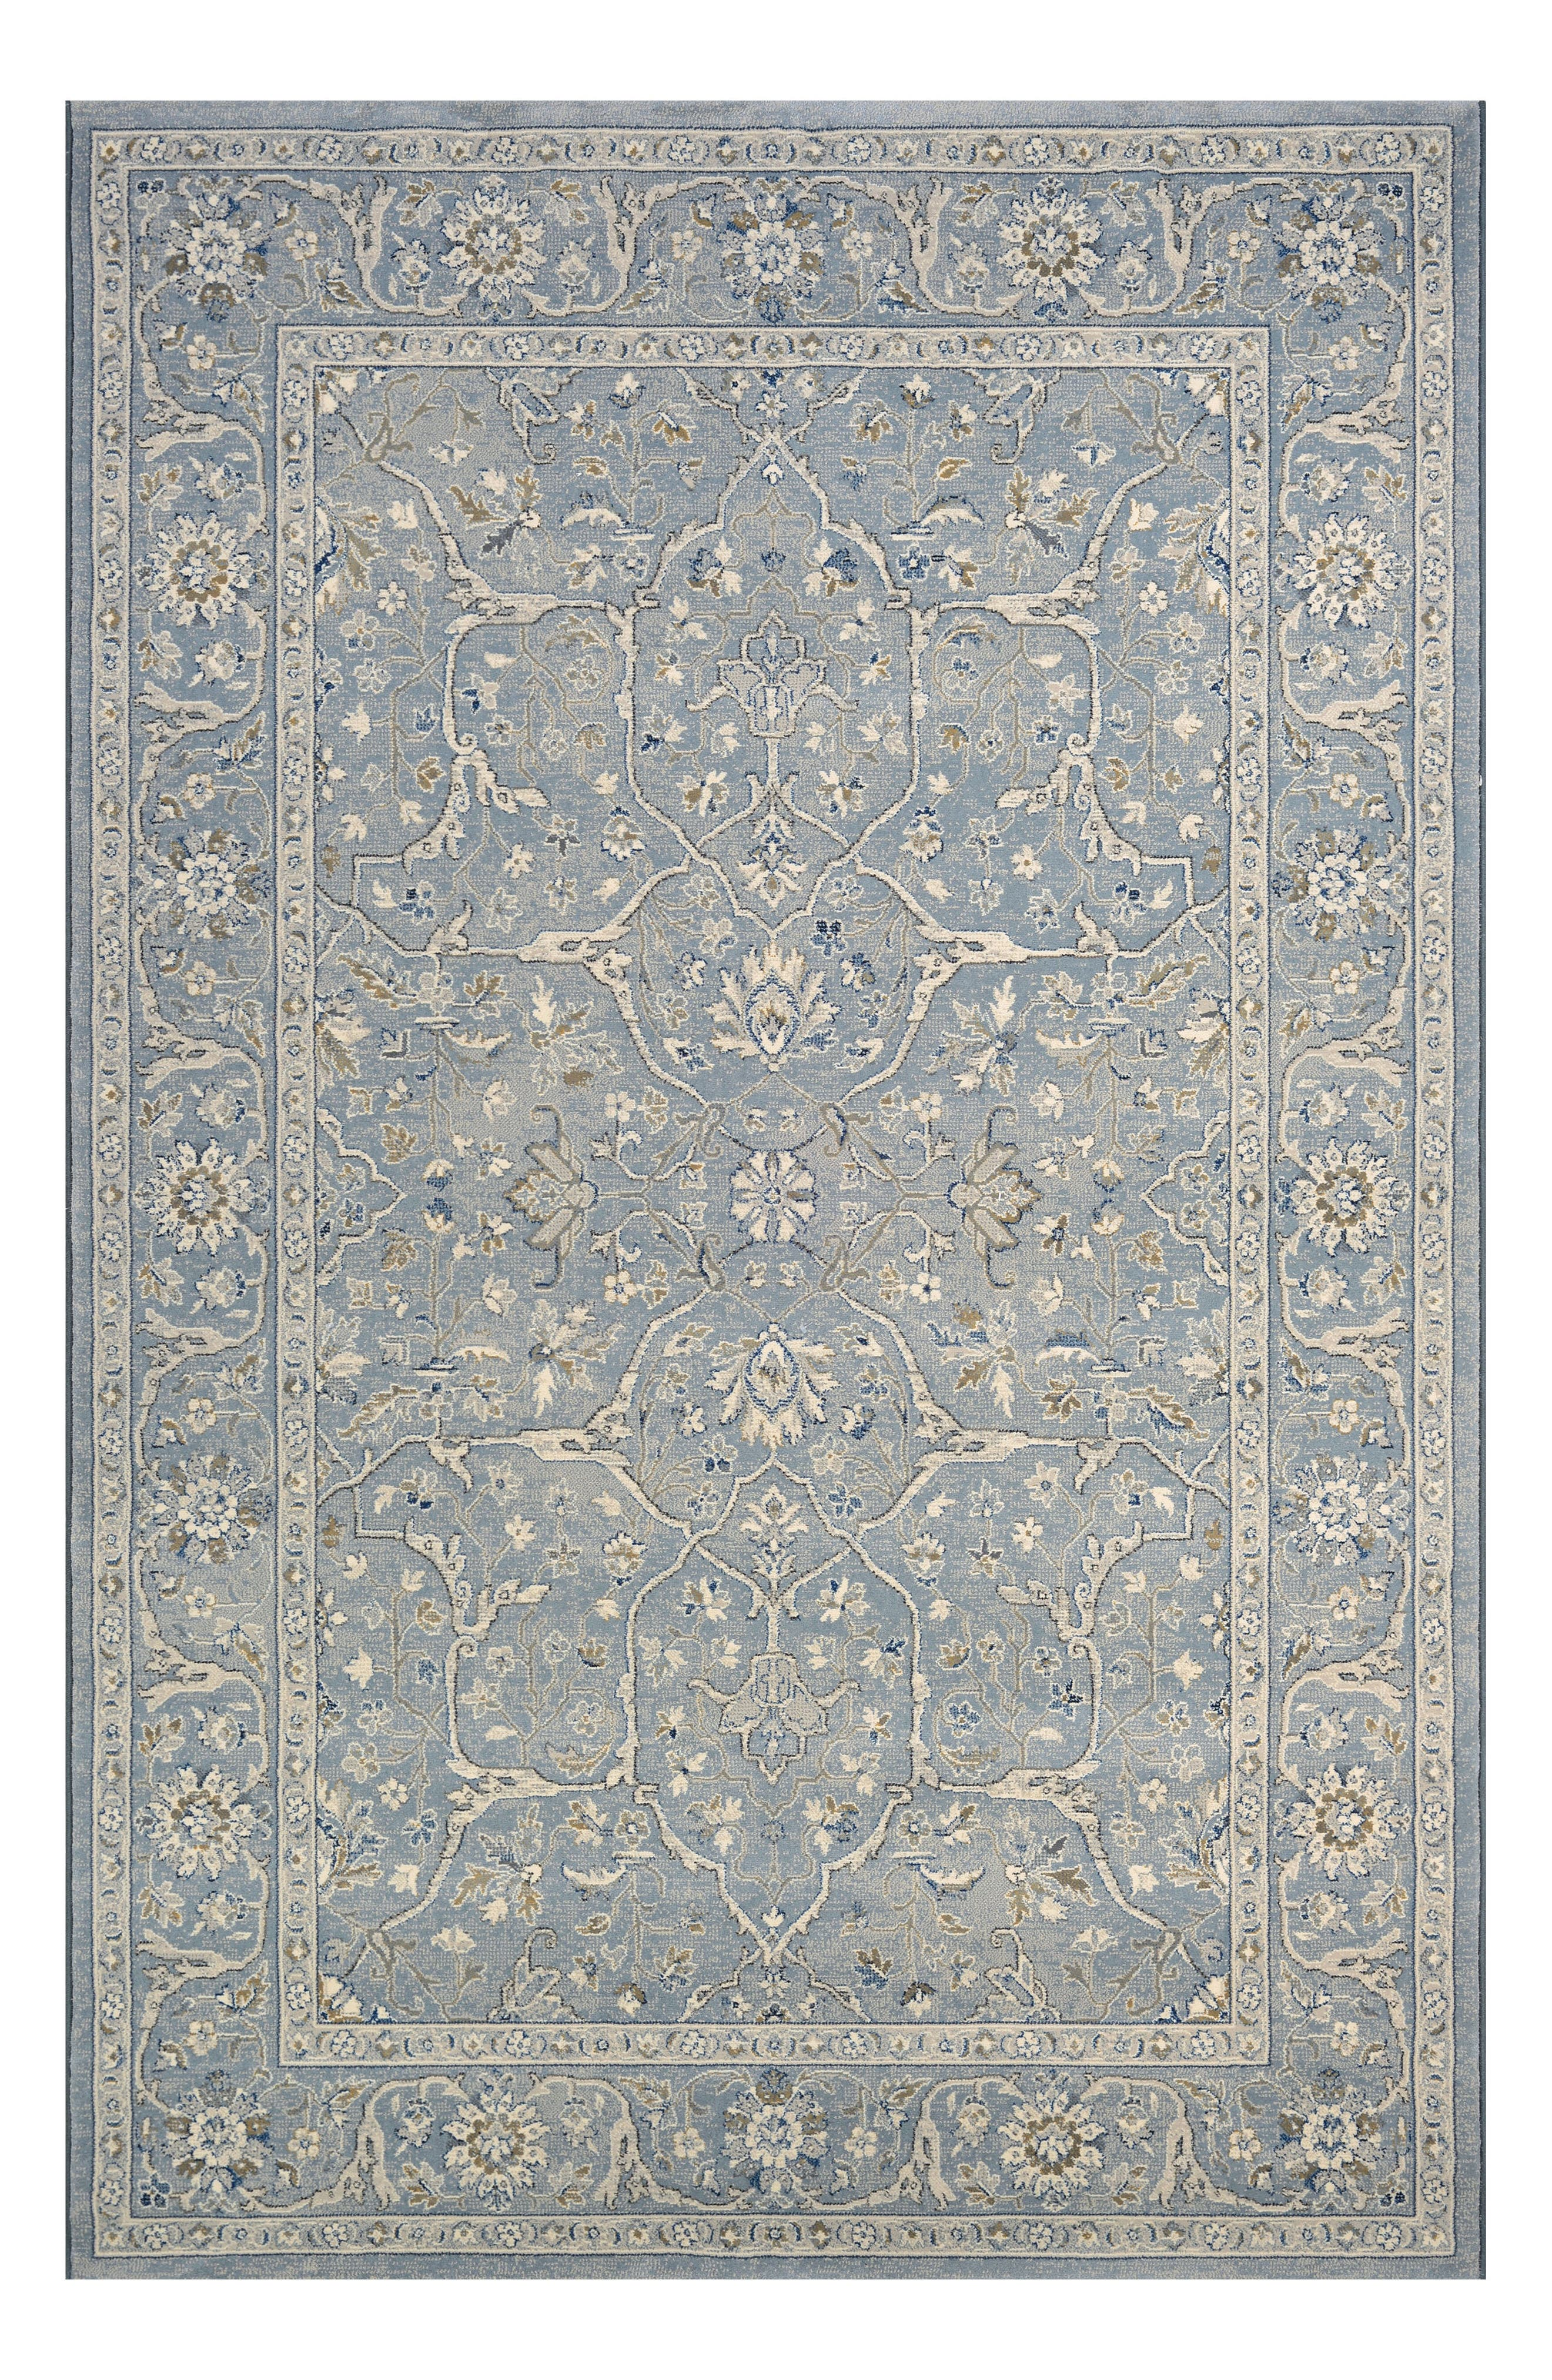 Main Image - Couristan Floral Yazd Indoor/Outdoor Rug